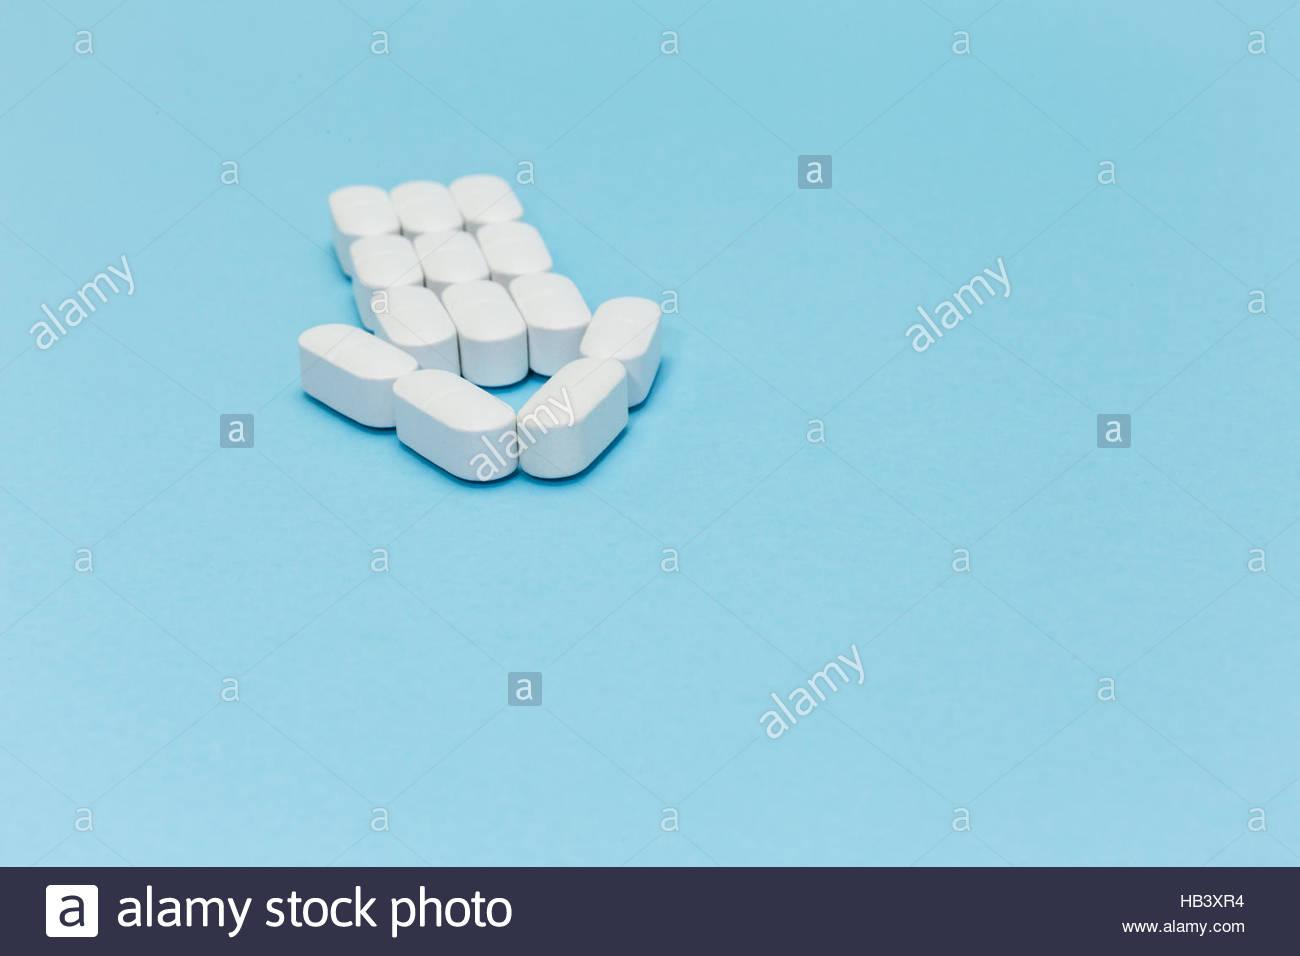 Flecha de píldoras sobre fondo azul. Imagen De Stock